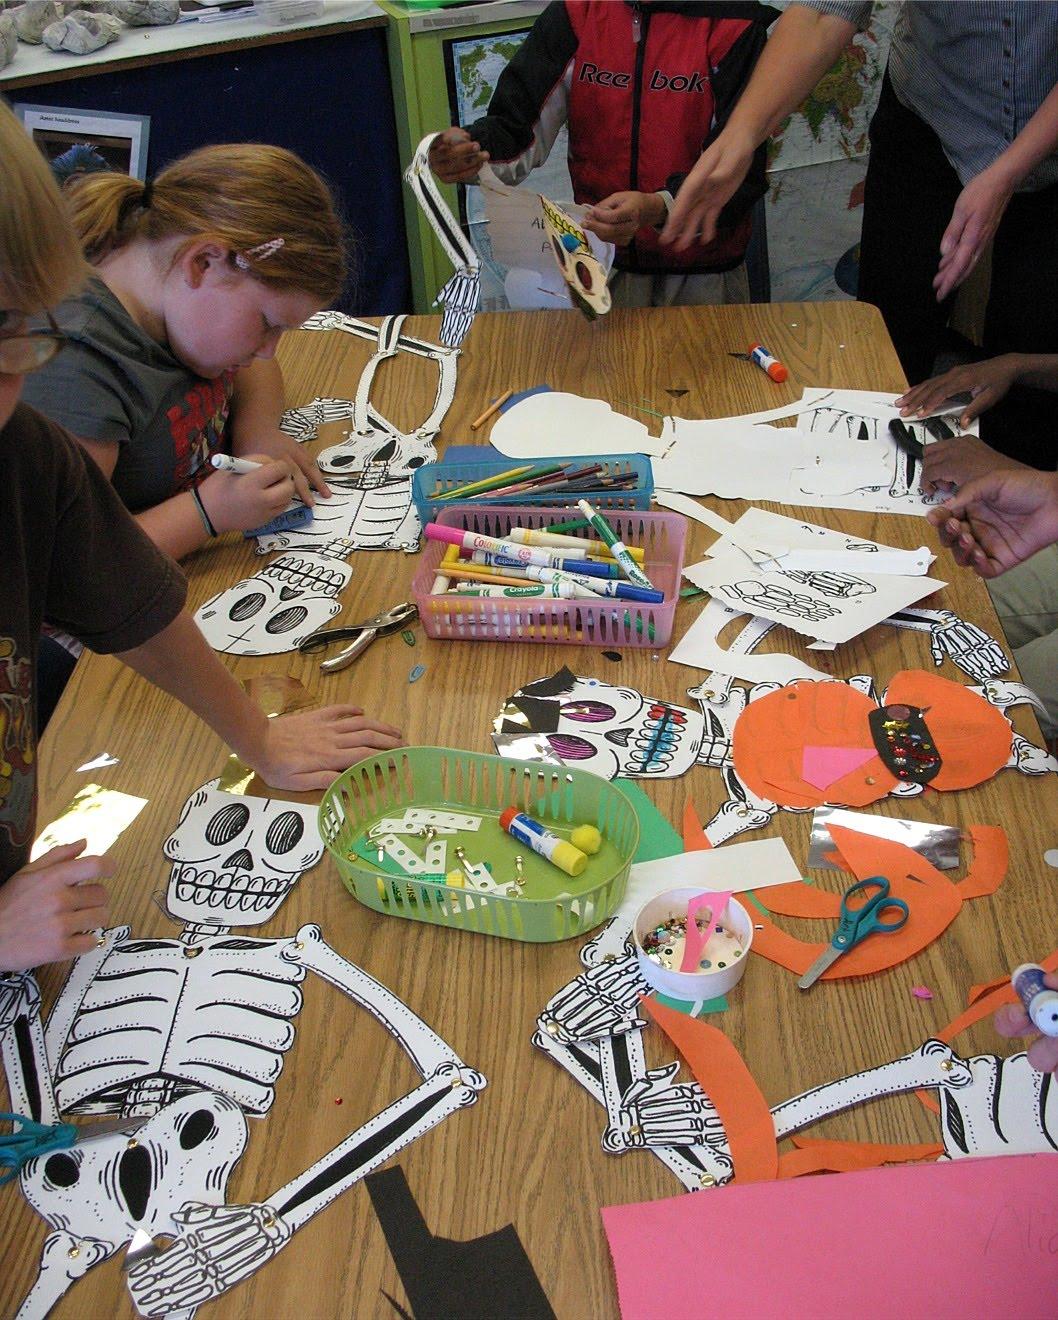 Welcome To Ms Wagner S Elementary Art Studio: The David Lubin Art Studio: September 2009